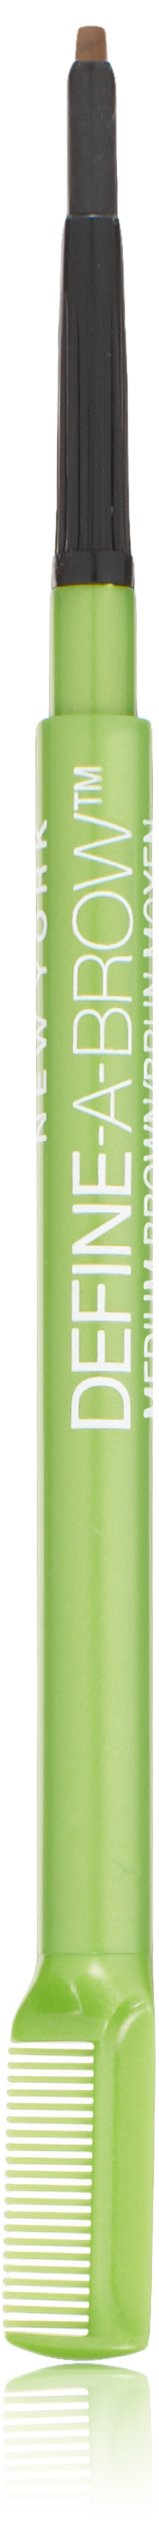 Maybelline New York Define-A-Brow Eyebrow Pencil, 643 Medium Brown, 0.0010 Ounce